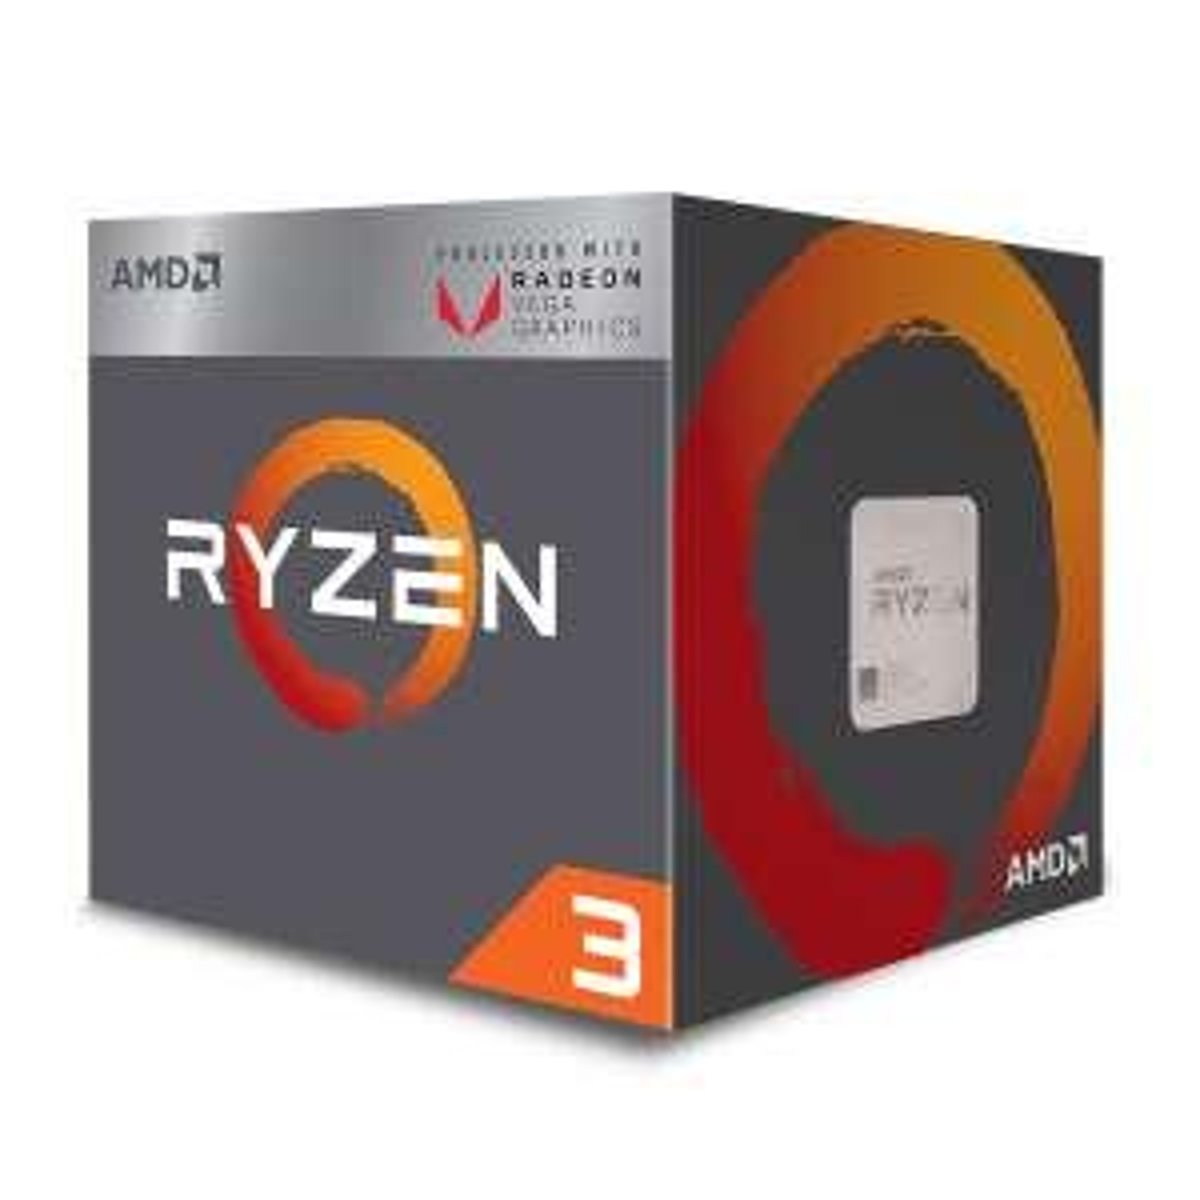 Processeur AMD Ryzen 3 2200G (3.5 GHz) avec Radeon Vega Graphics 8 coeurs